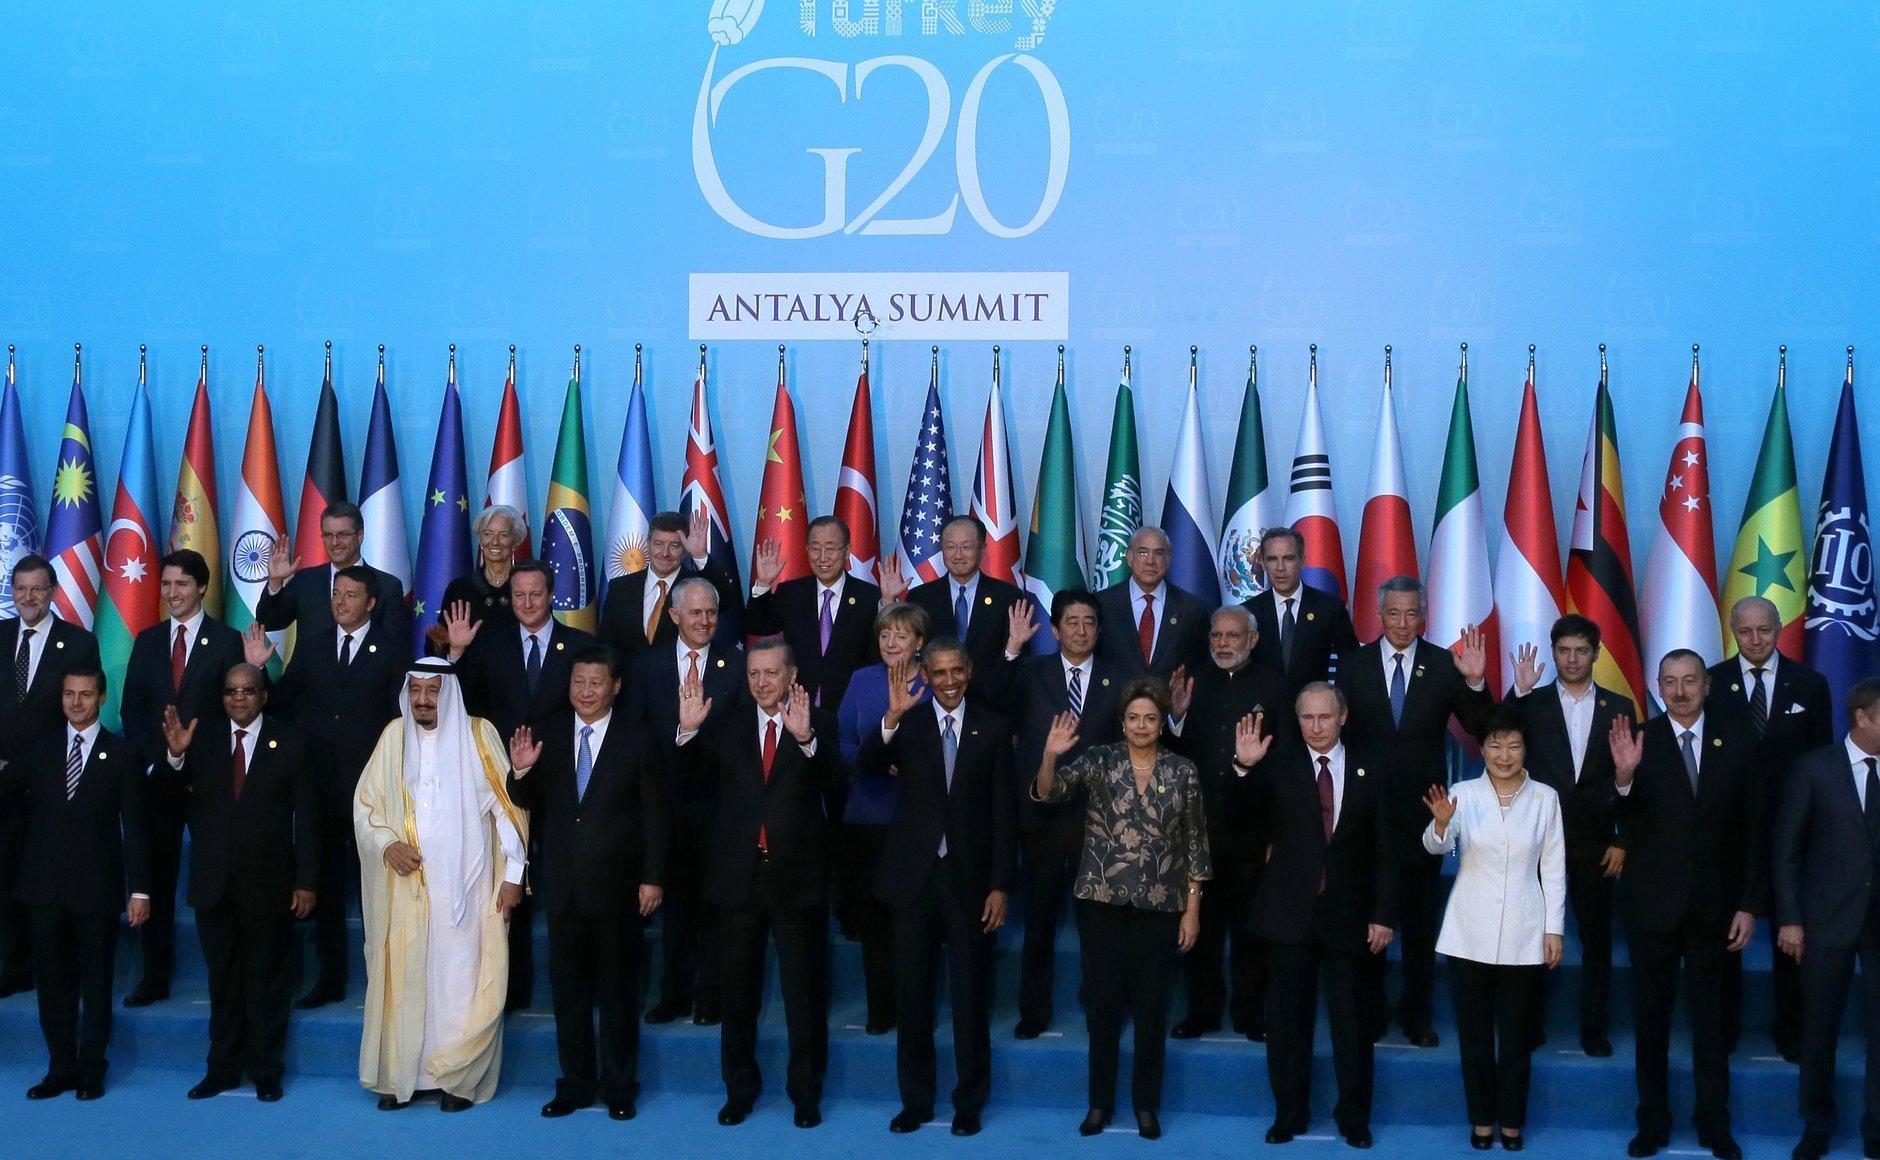 ВЯпонии назвали дату проведения саммита G20